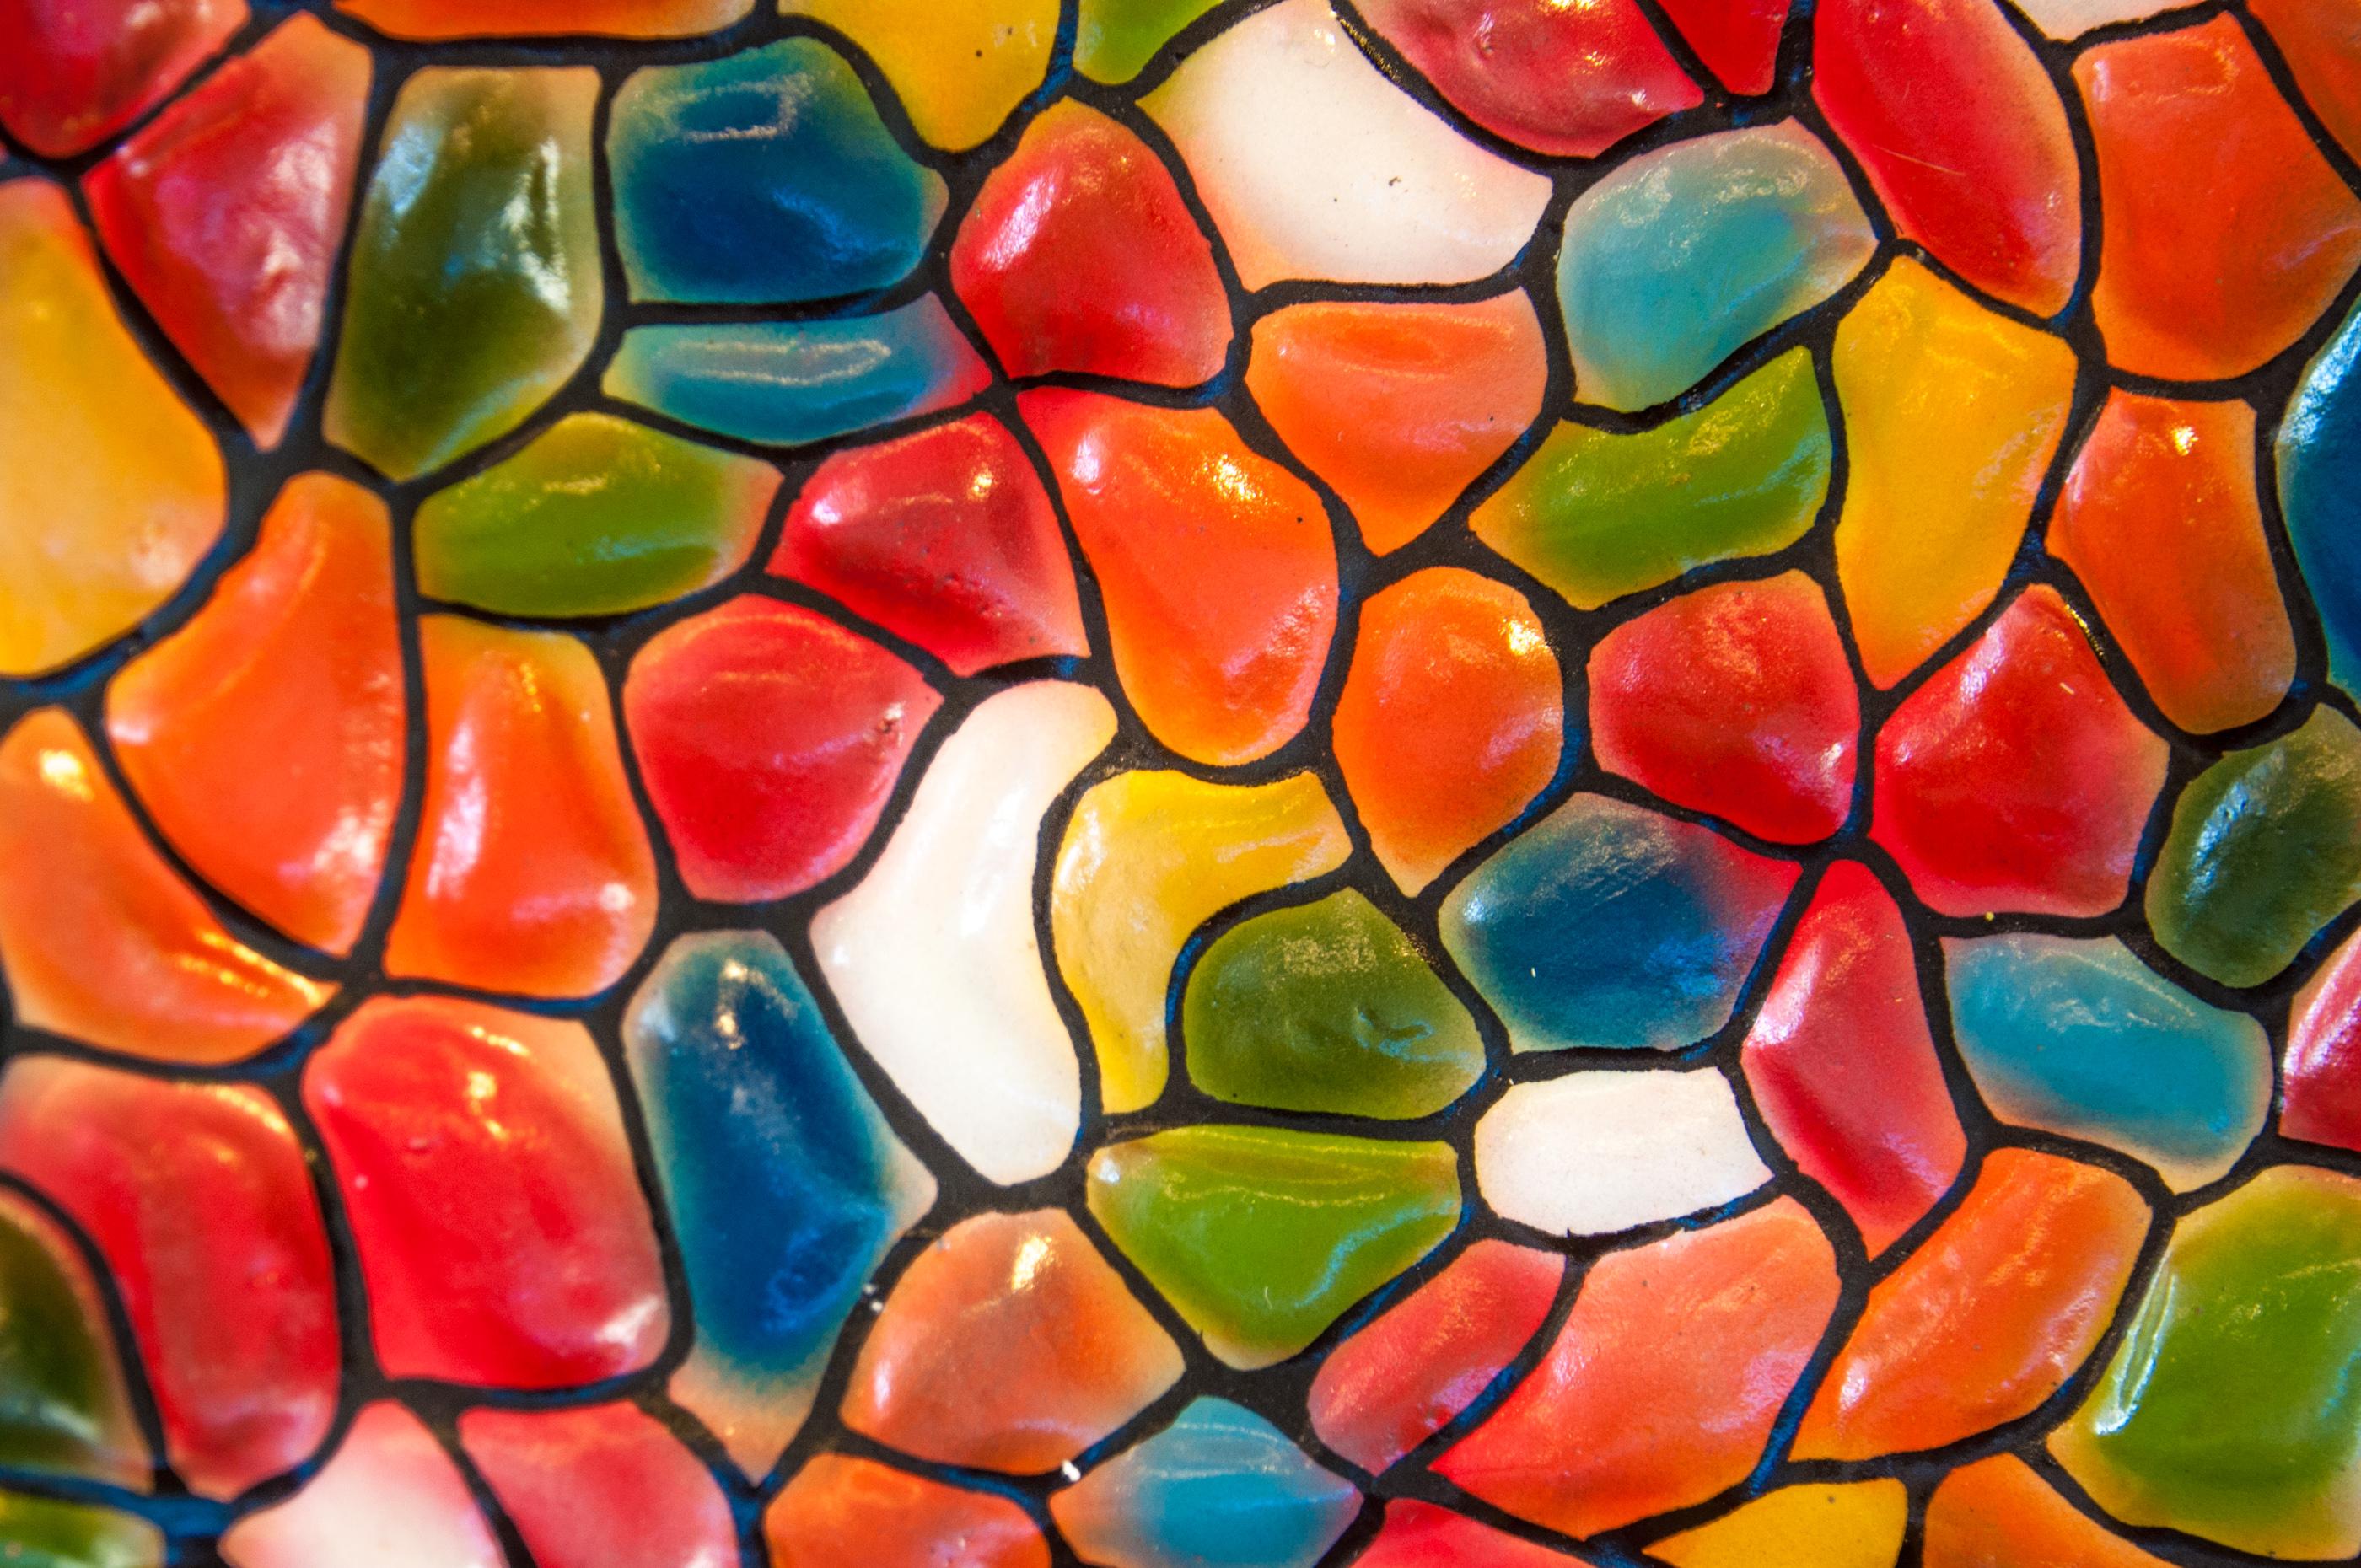 Colorful ceramic tiles wallpaper photo